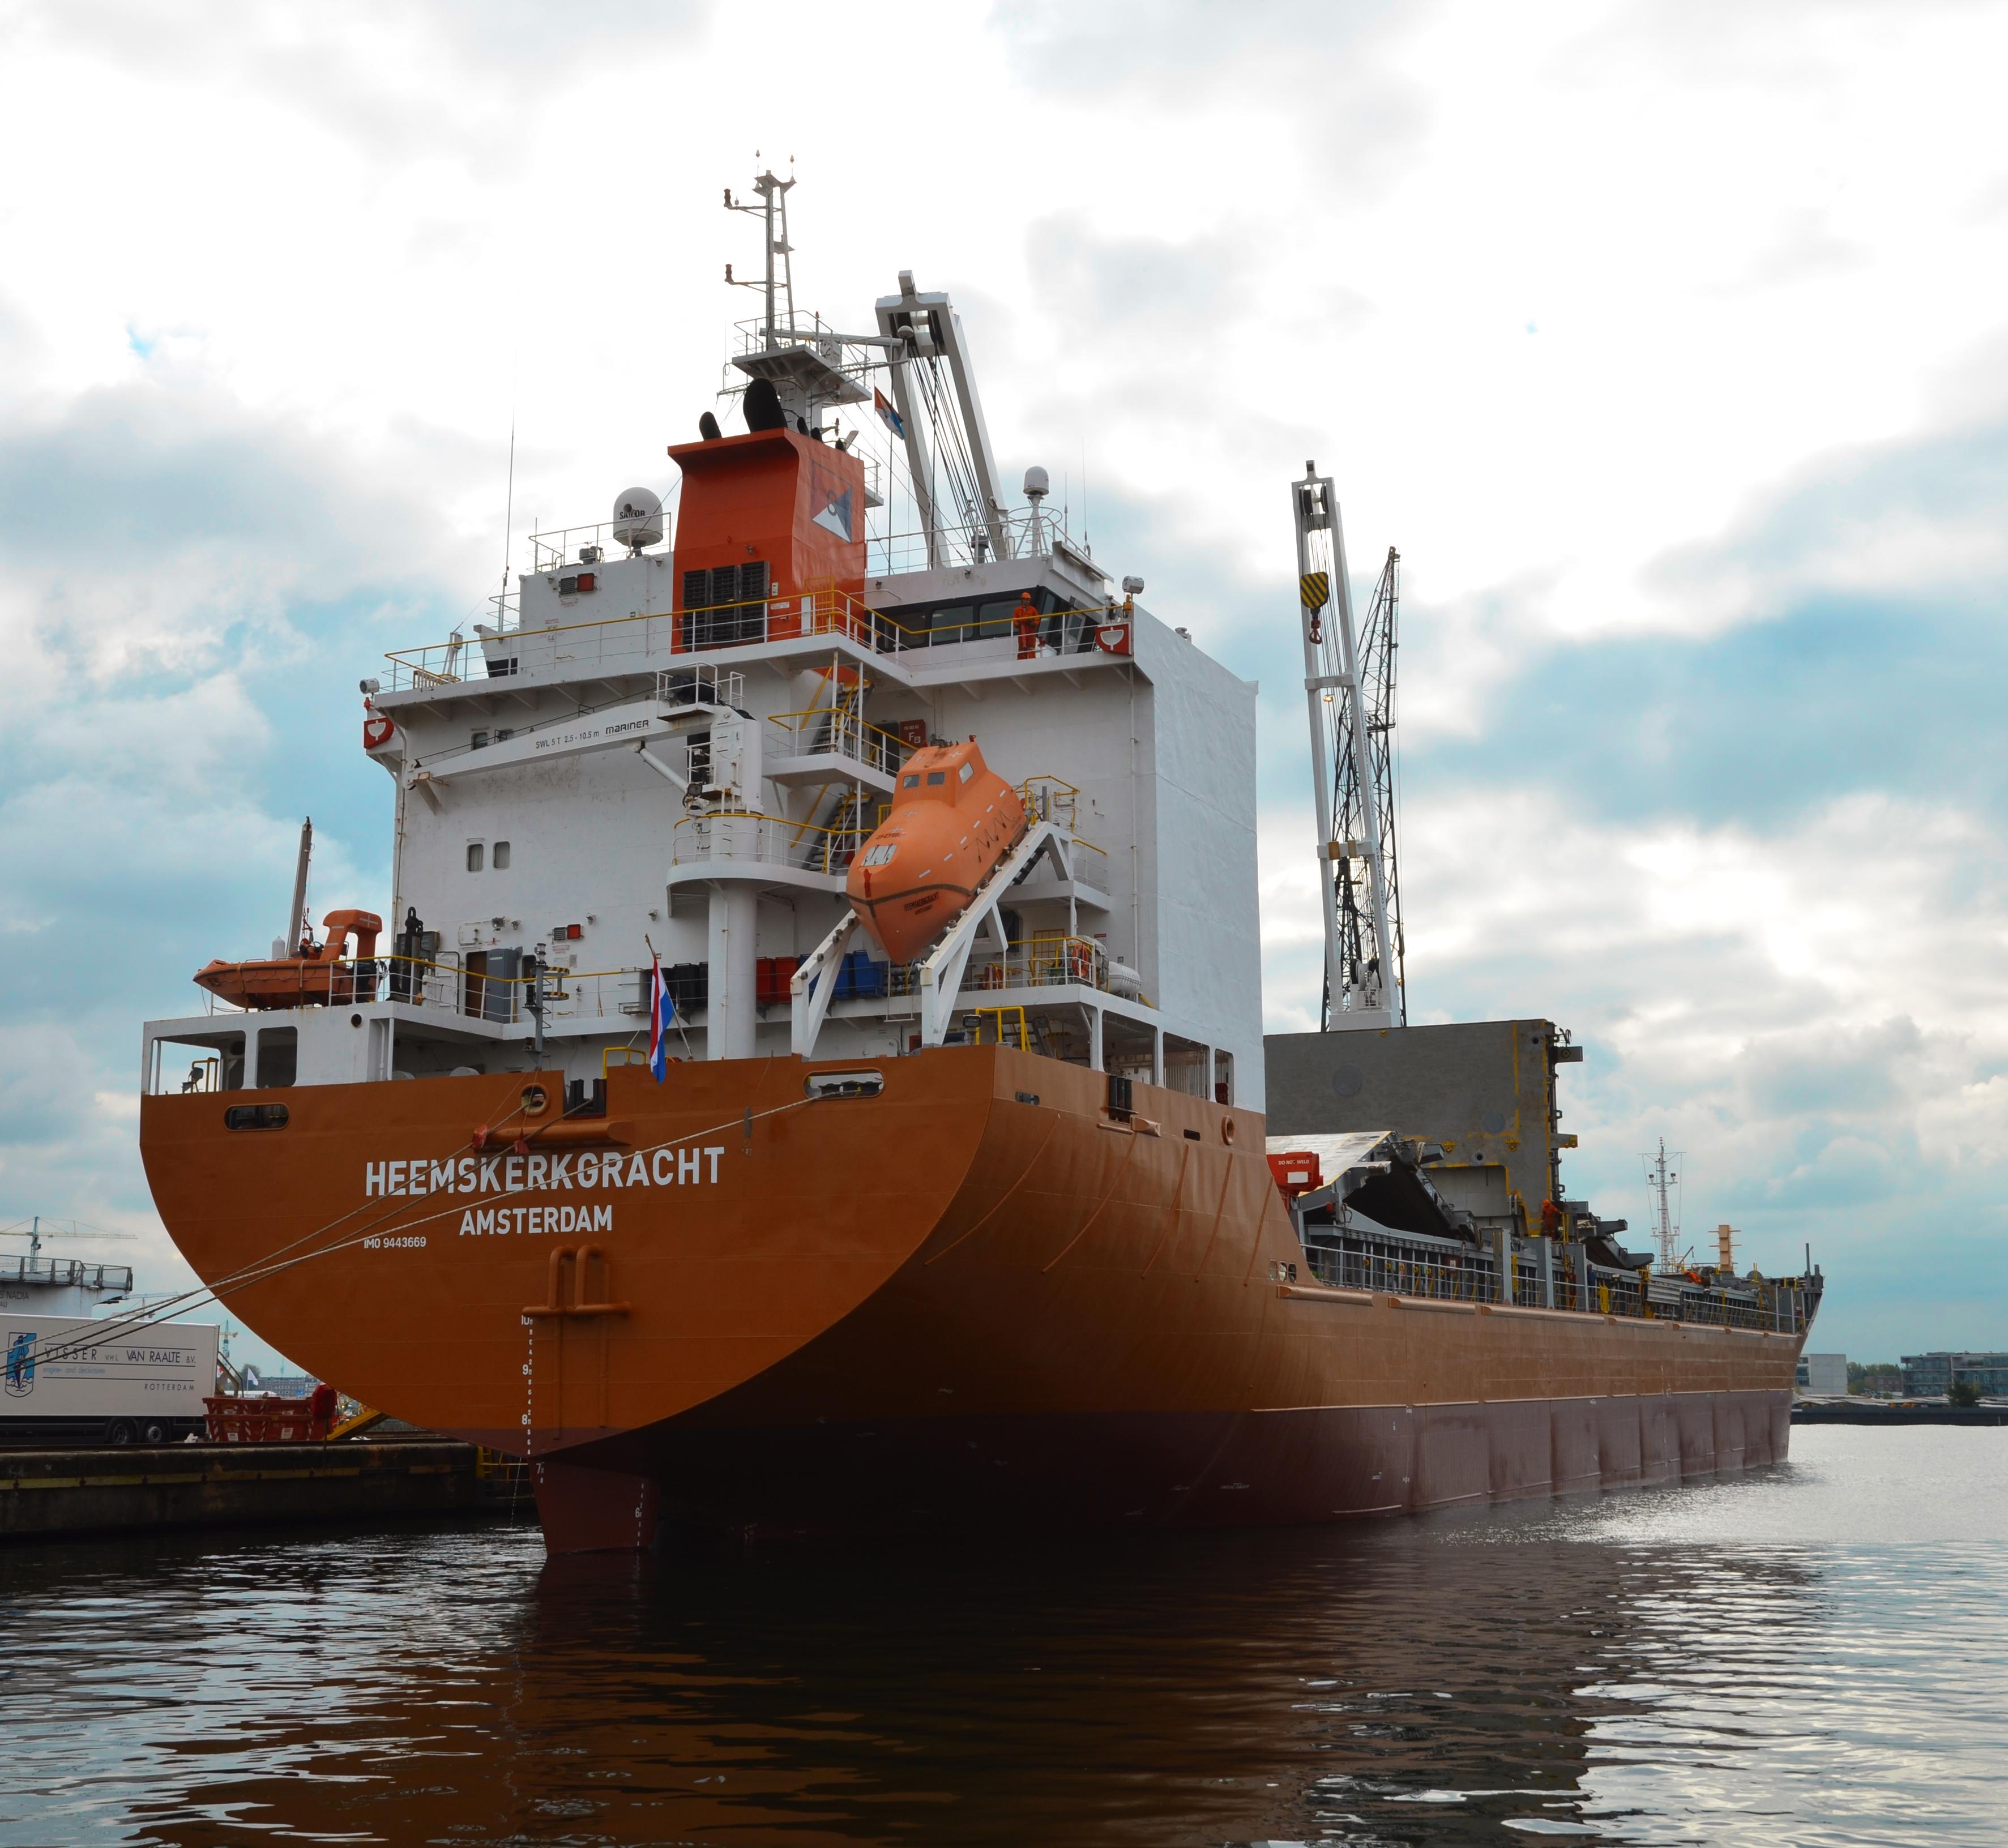 324d90ef3ba mv Heemskerkgracht   mv Hemgracht added to Spliethoff fleet ...